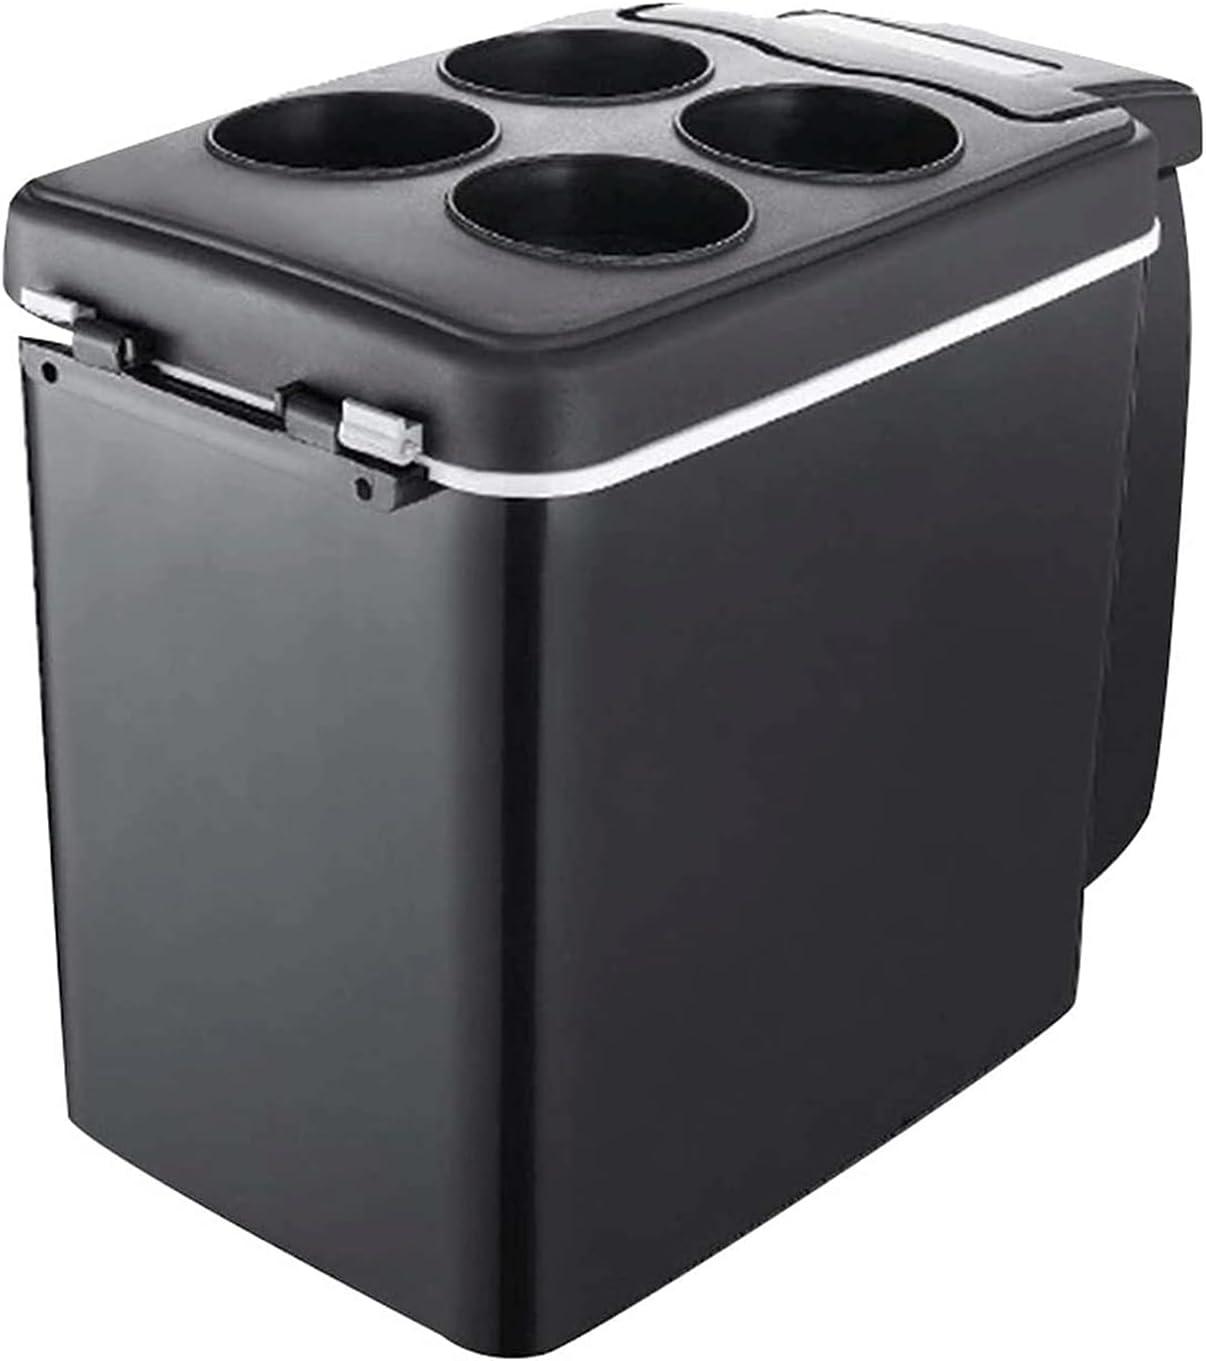 LJJSMG Mini Fridge gift 6 Liter 10 Max 73% OFF Large Can Warmer Cooler Capaci and